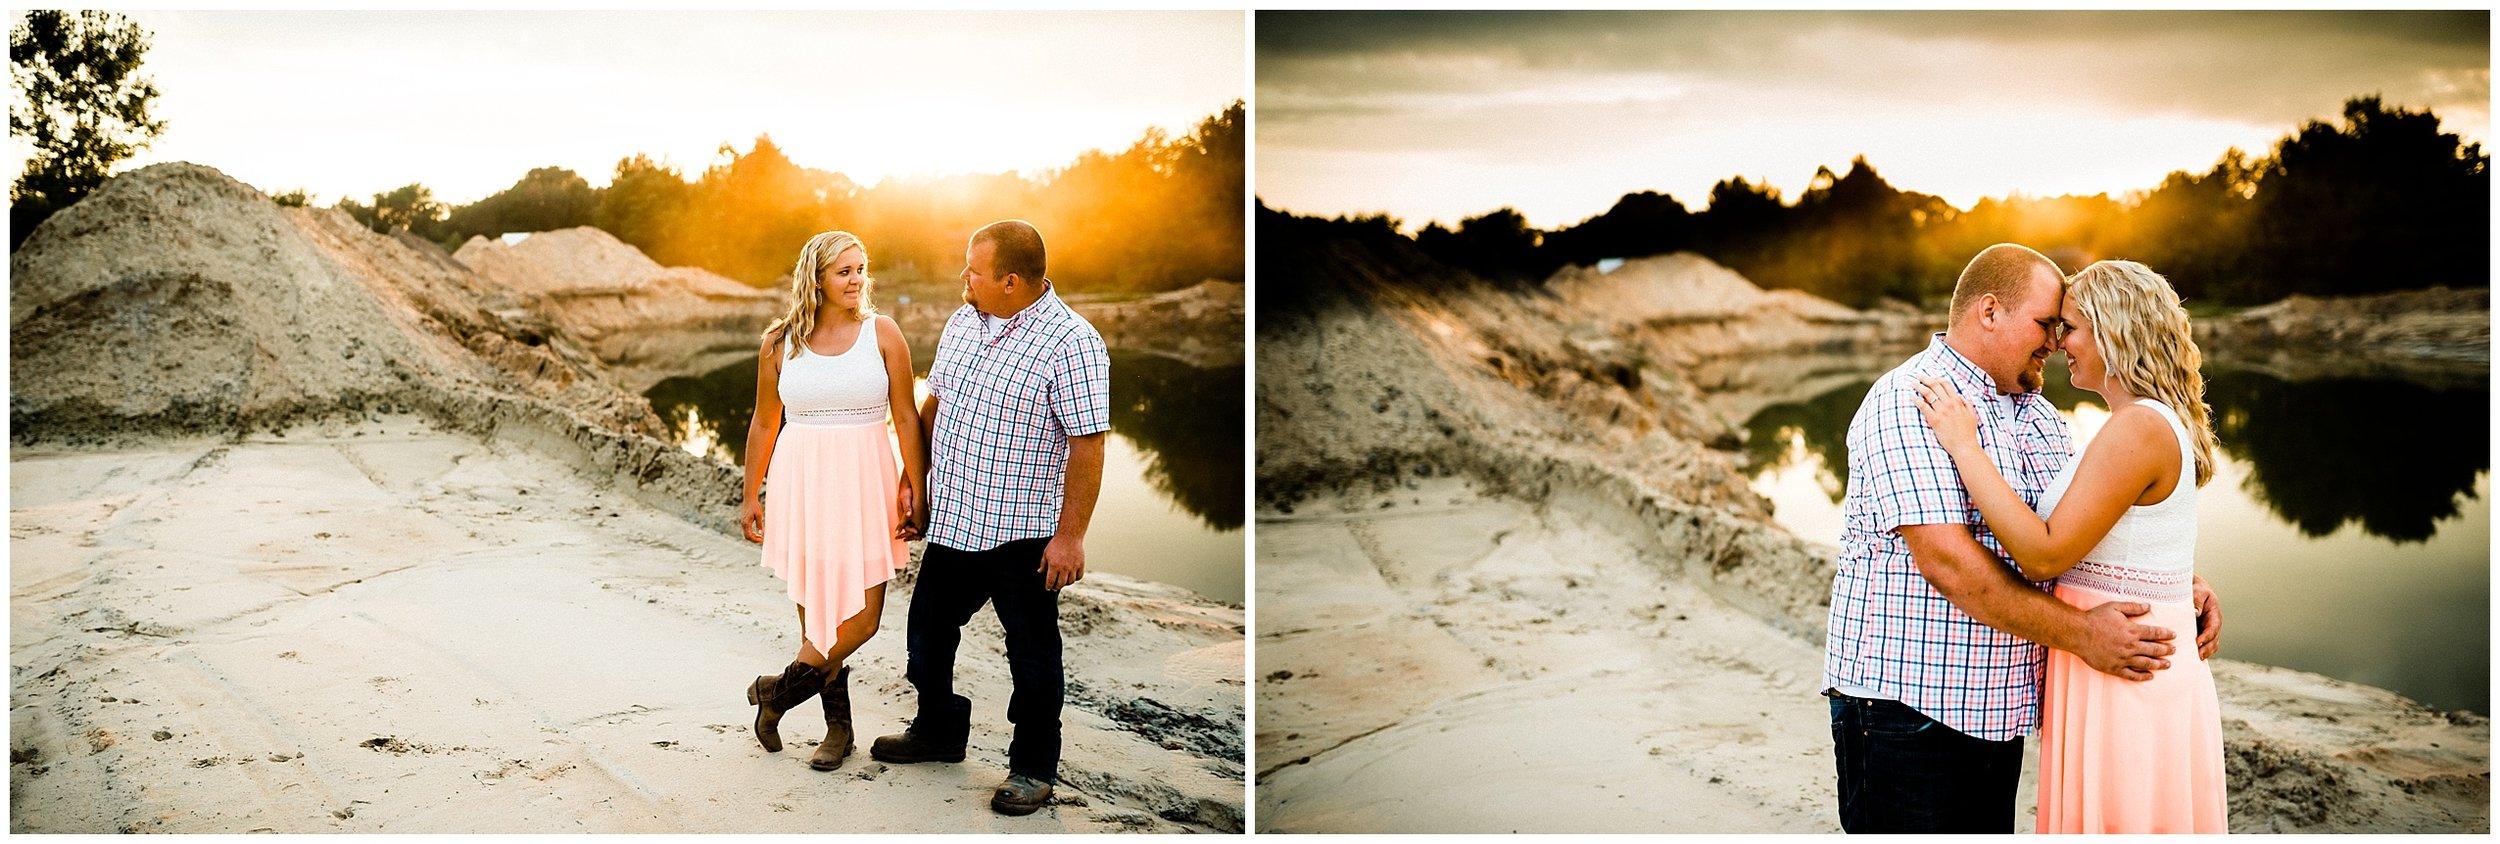 Nate + Tamryn | Engaged #kyleepaigephotography_1040.jpg